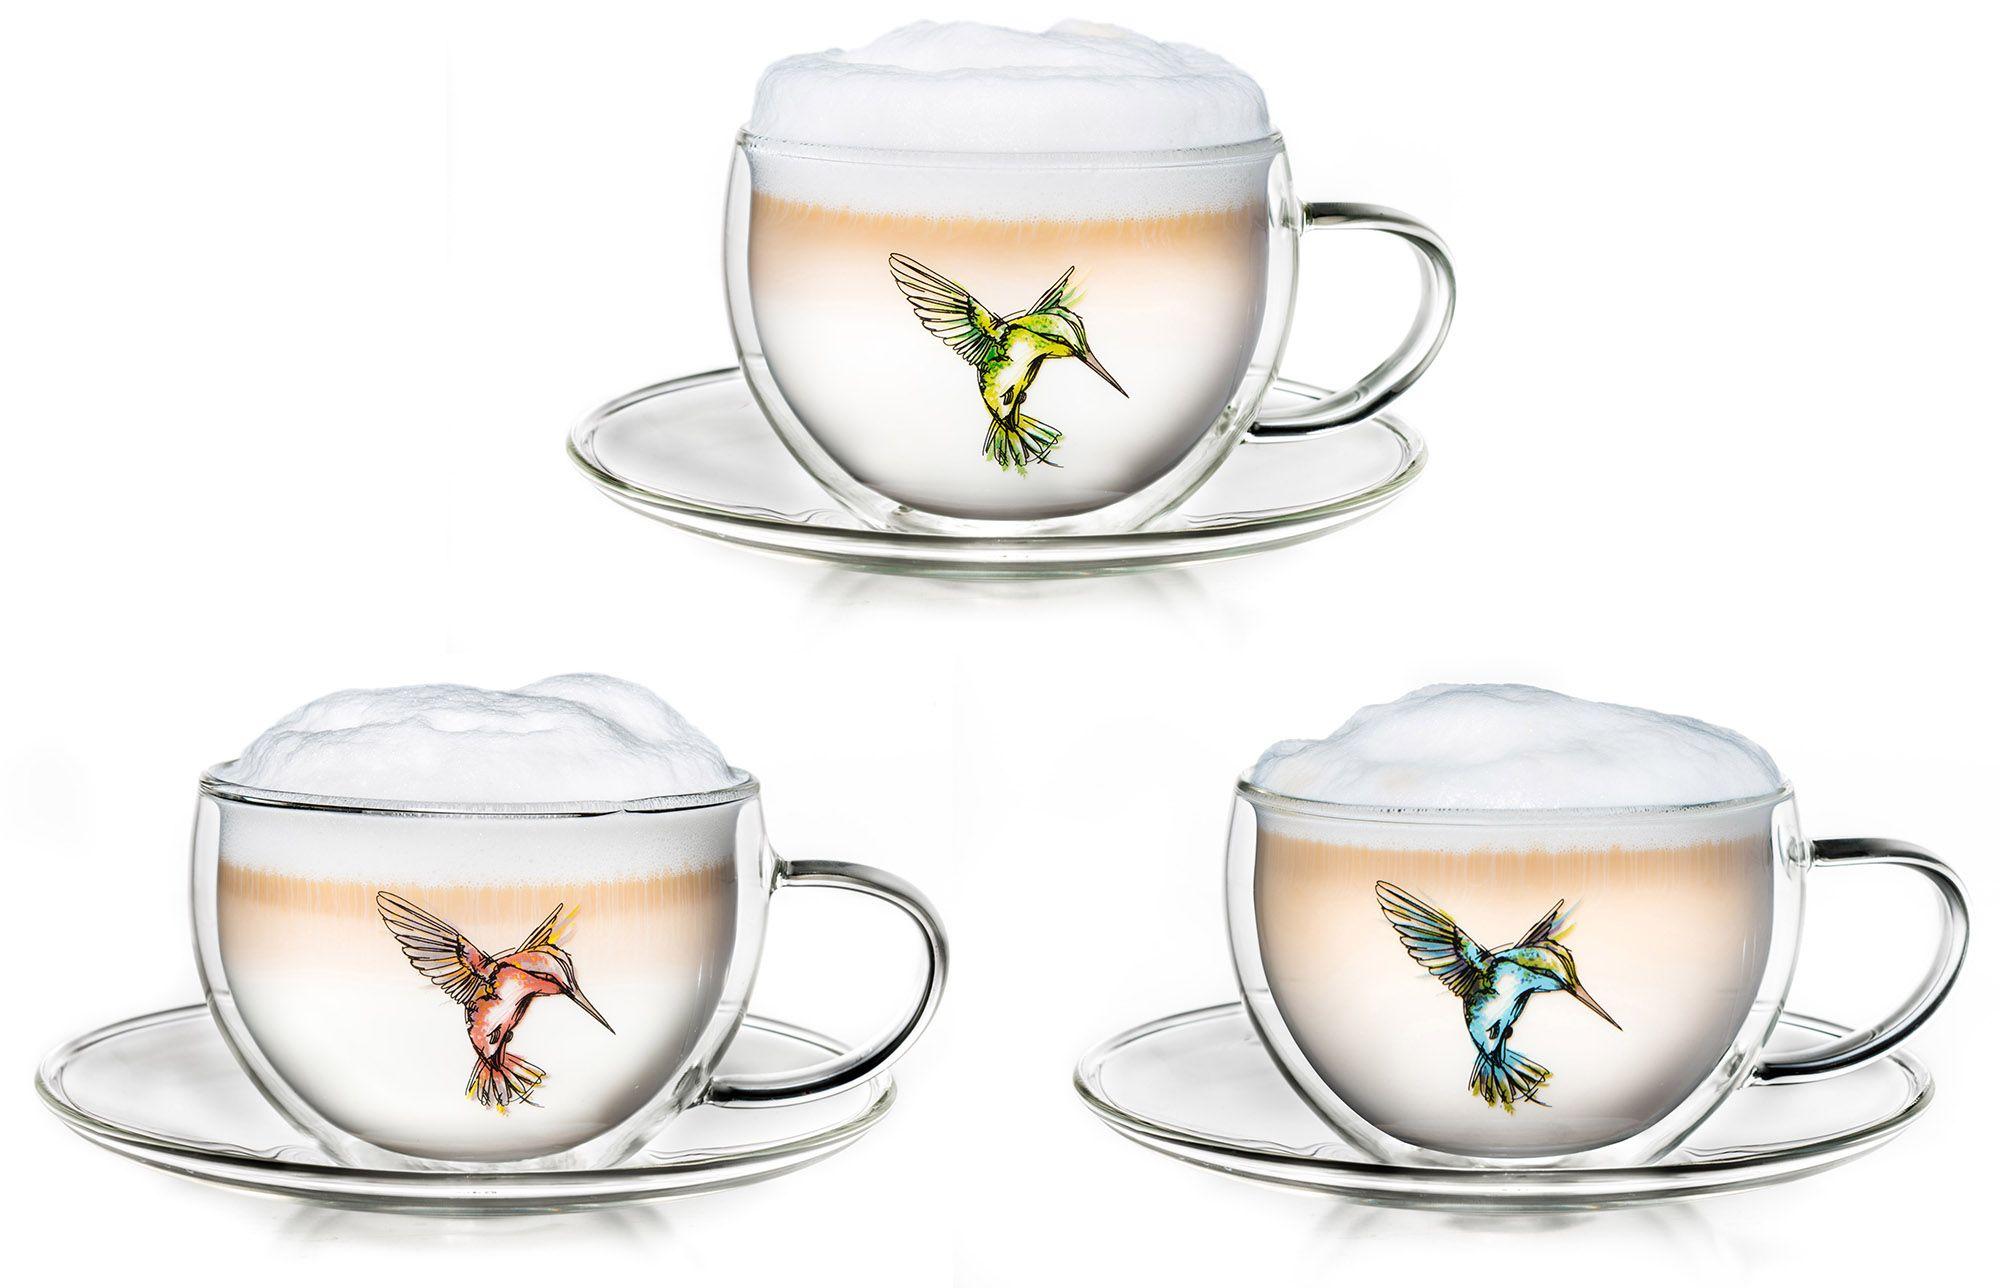 CREANO Creano Thermo-Tasse, 3-er Set, doppelwandige Tee-Tasse, Latte Macchiato Tasse, »Hummi«